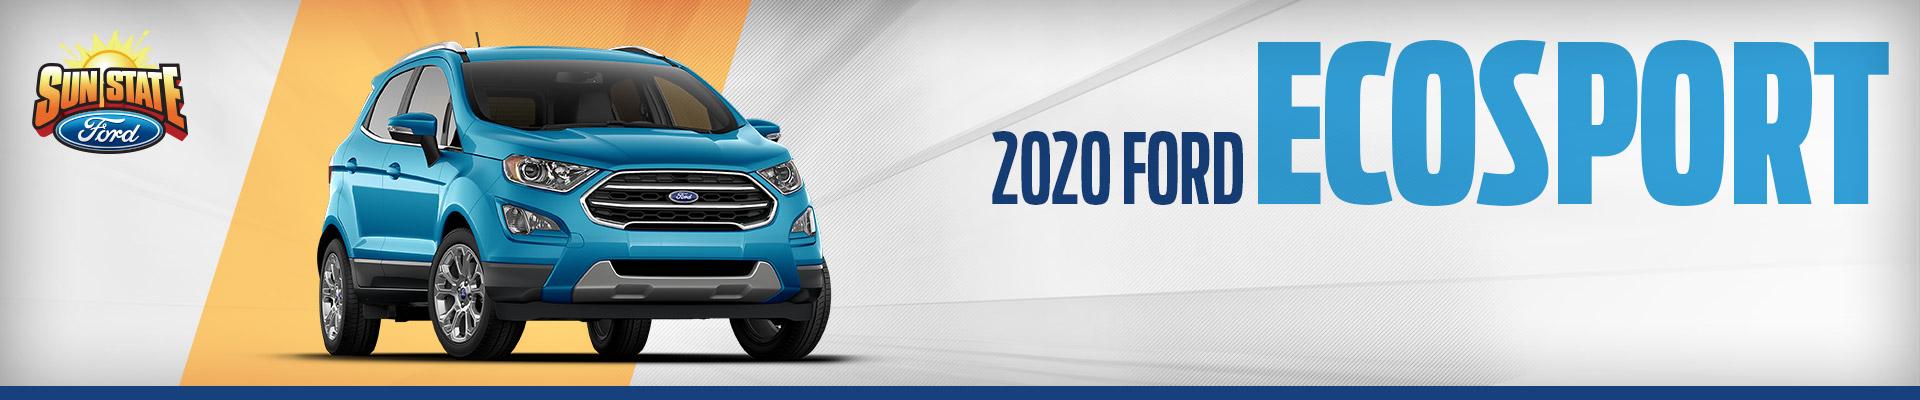 2020 Ford EcoSport - Sun State Ford - Orlando, FL